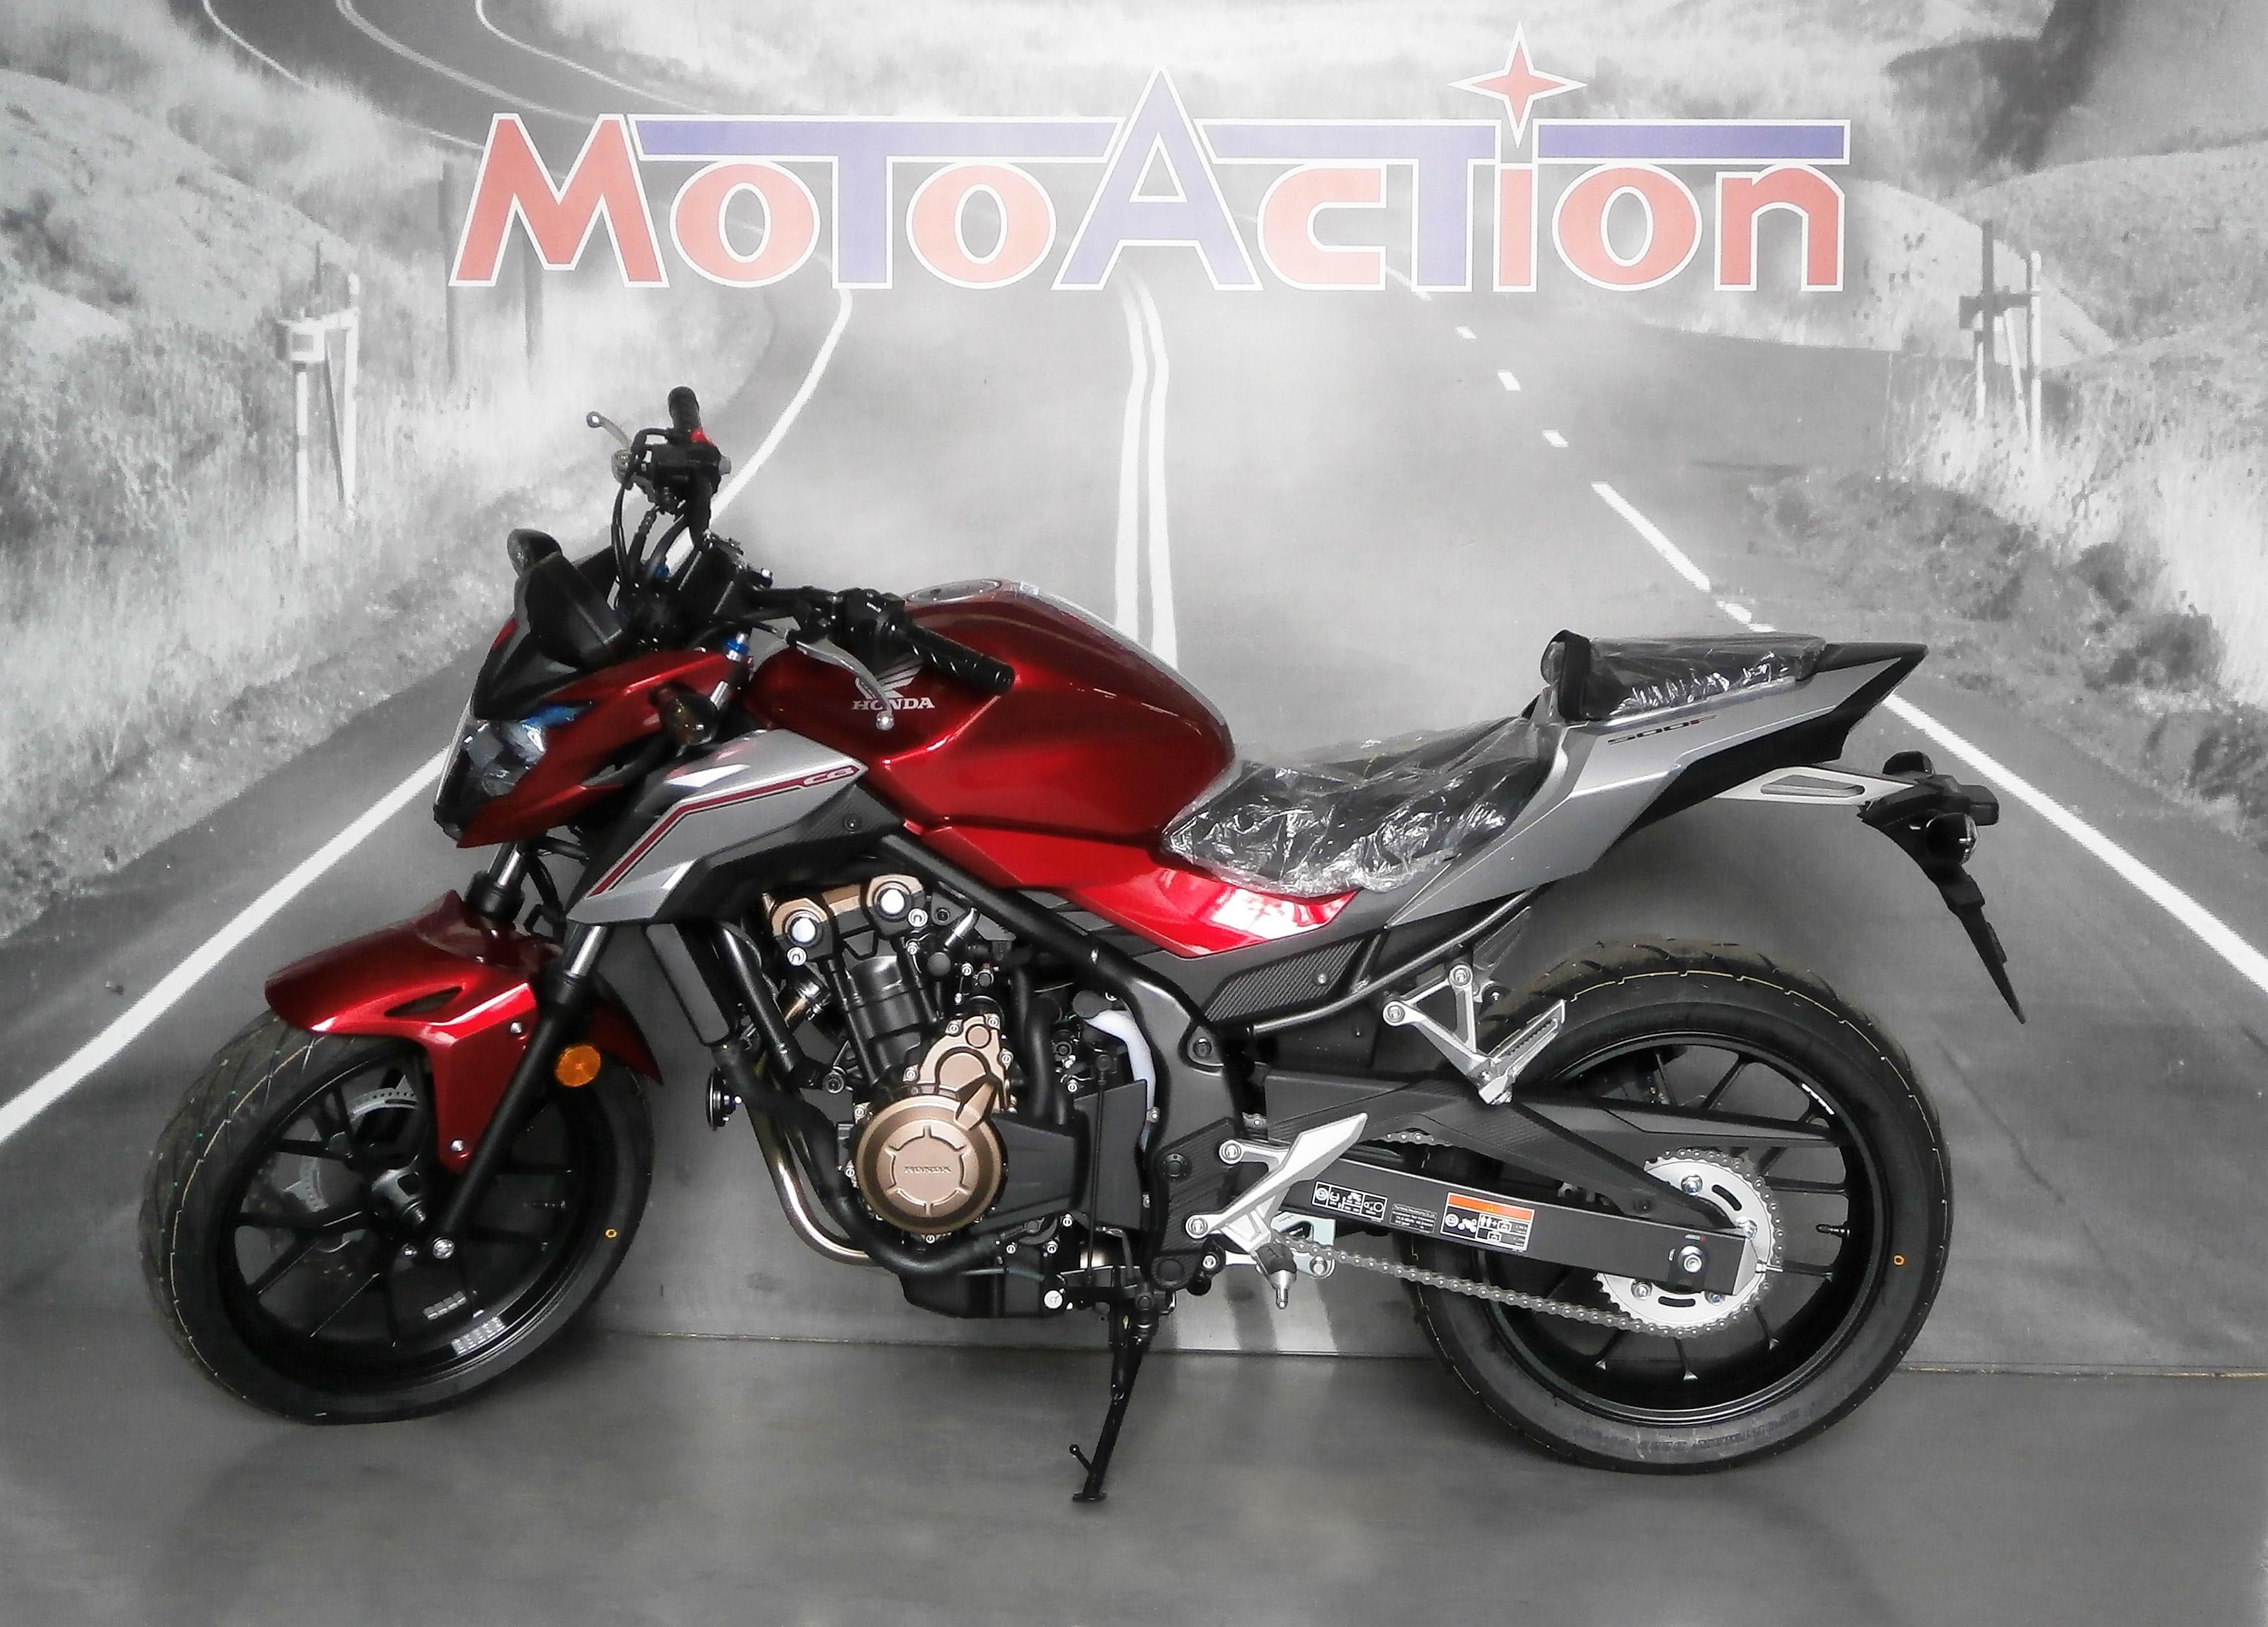 honda cb 500 f nuovo 2018 moto action concessionaria. Black Bedroom Furniture Sets. Home Design Ideas